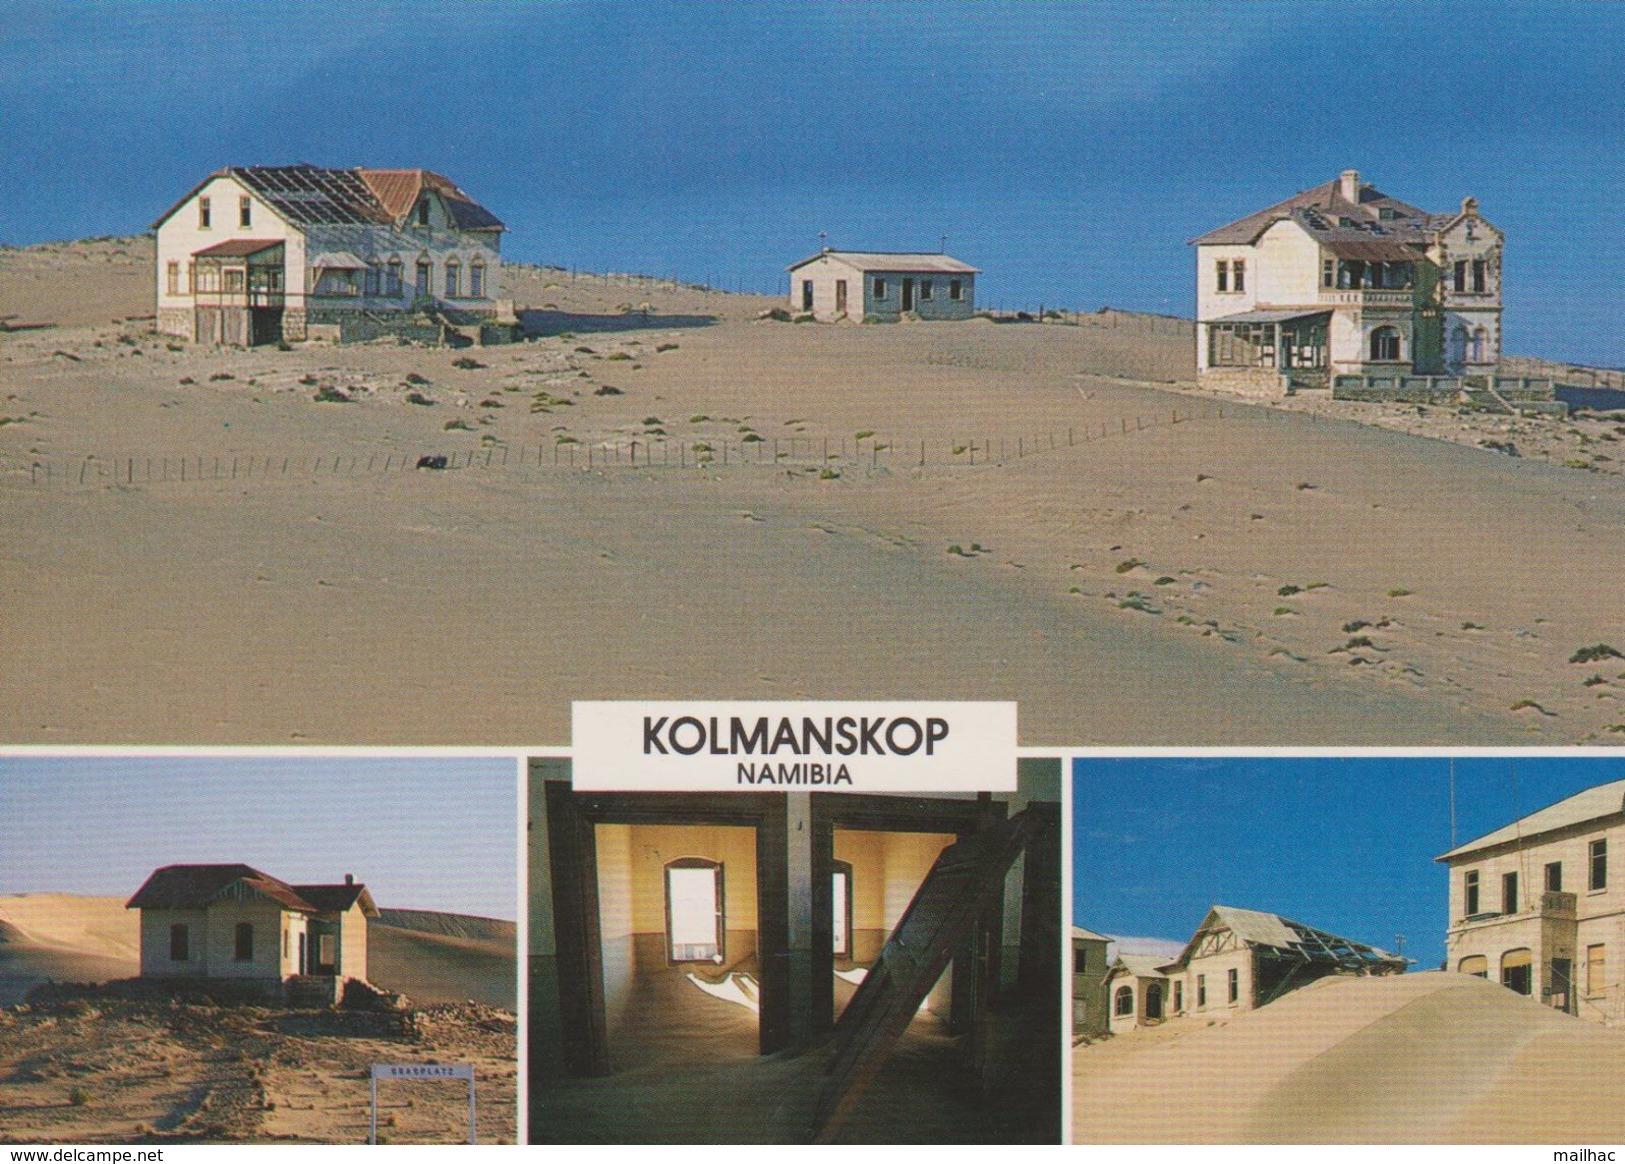 NAMIBIA - KOLMANSKOP - Ghost Town - Ville Fantôme - Namibie